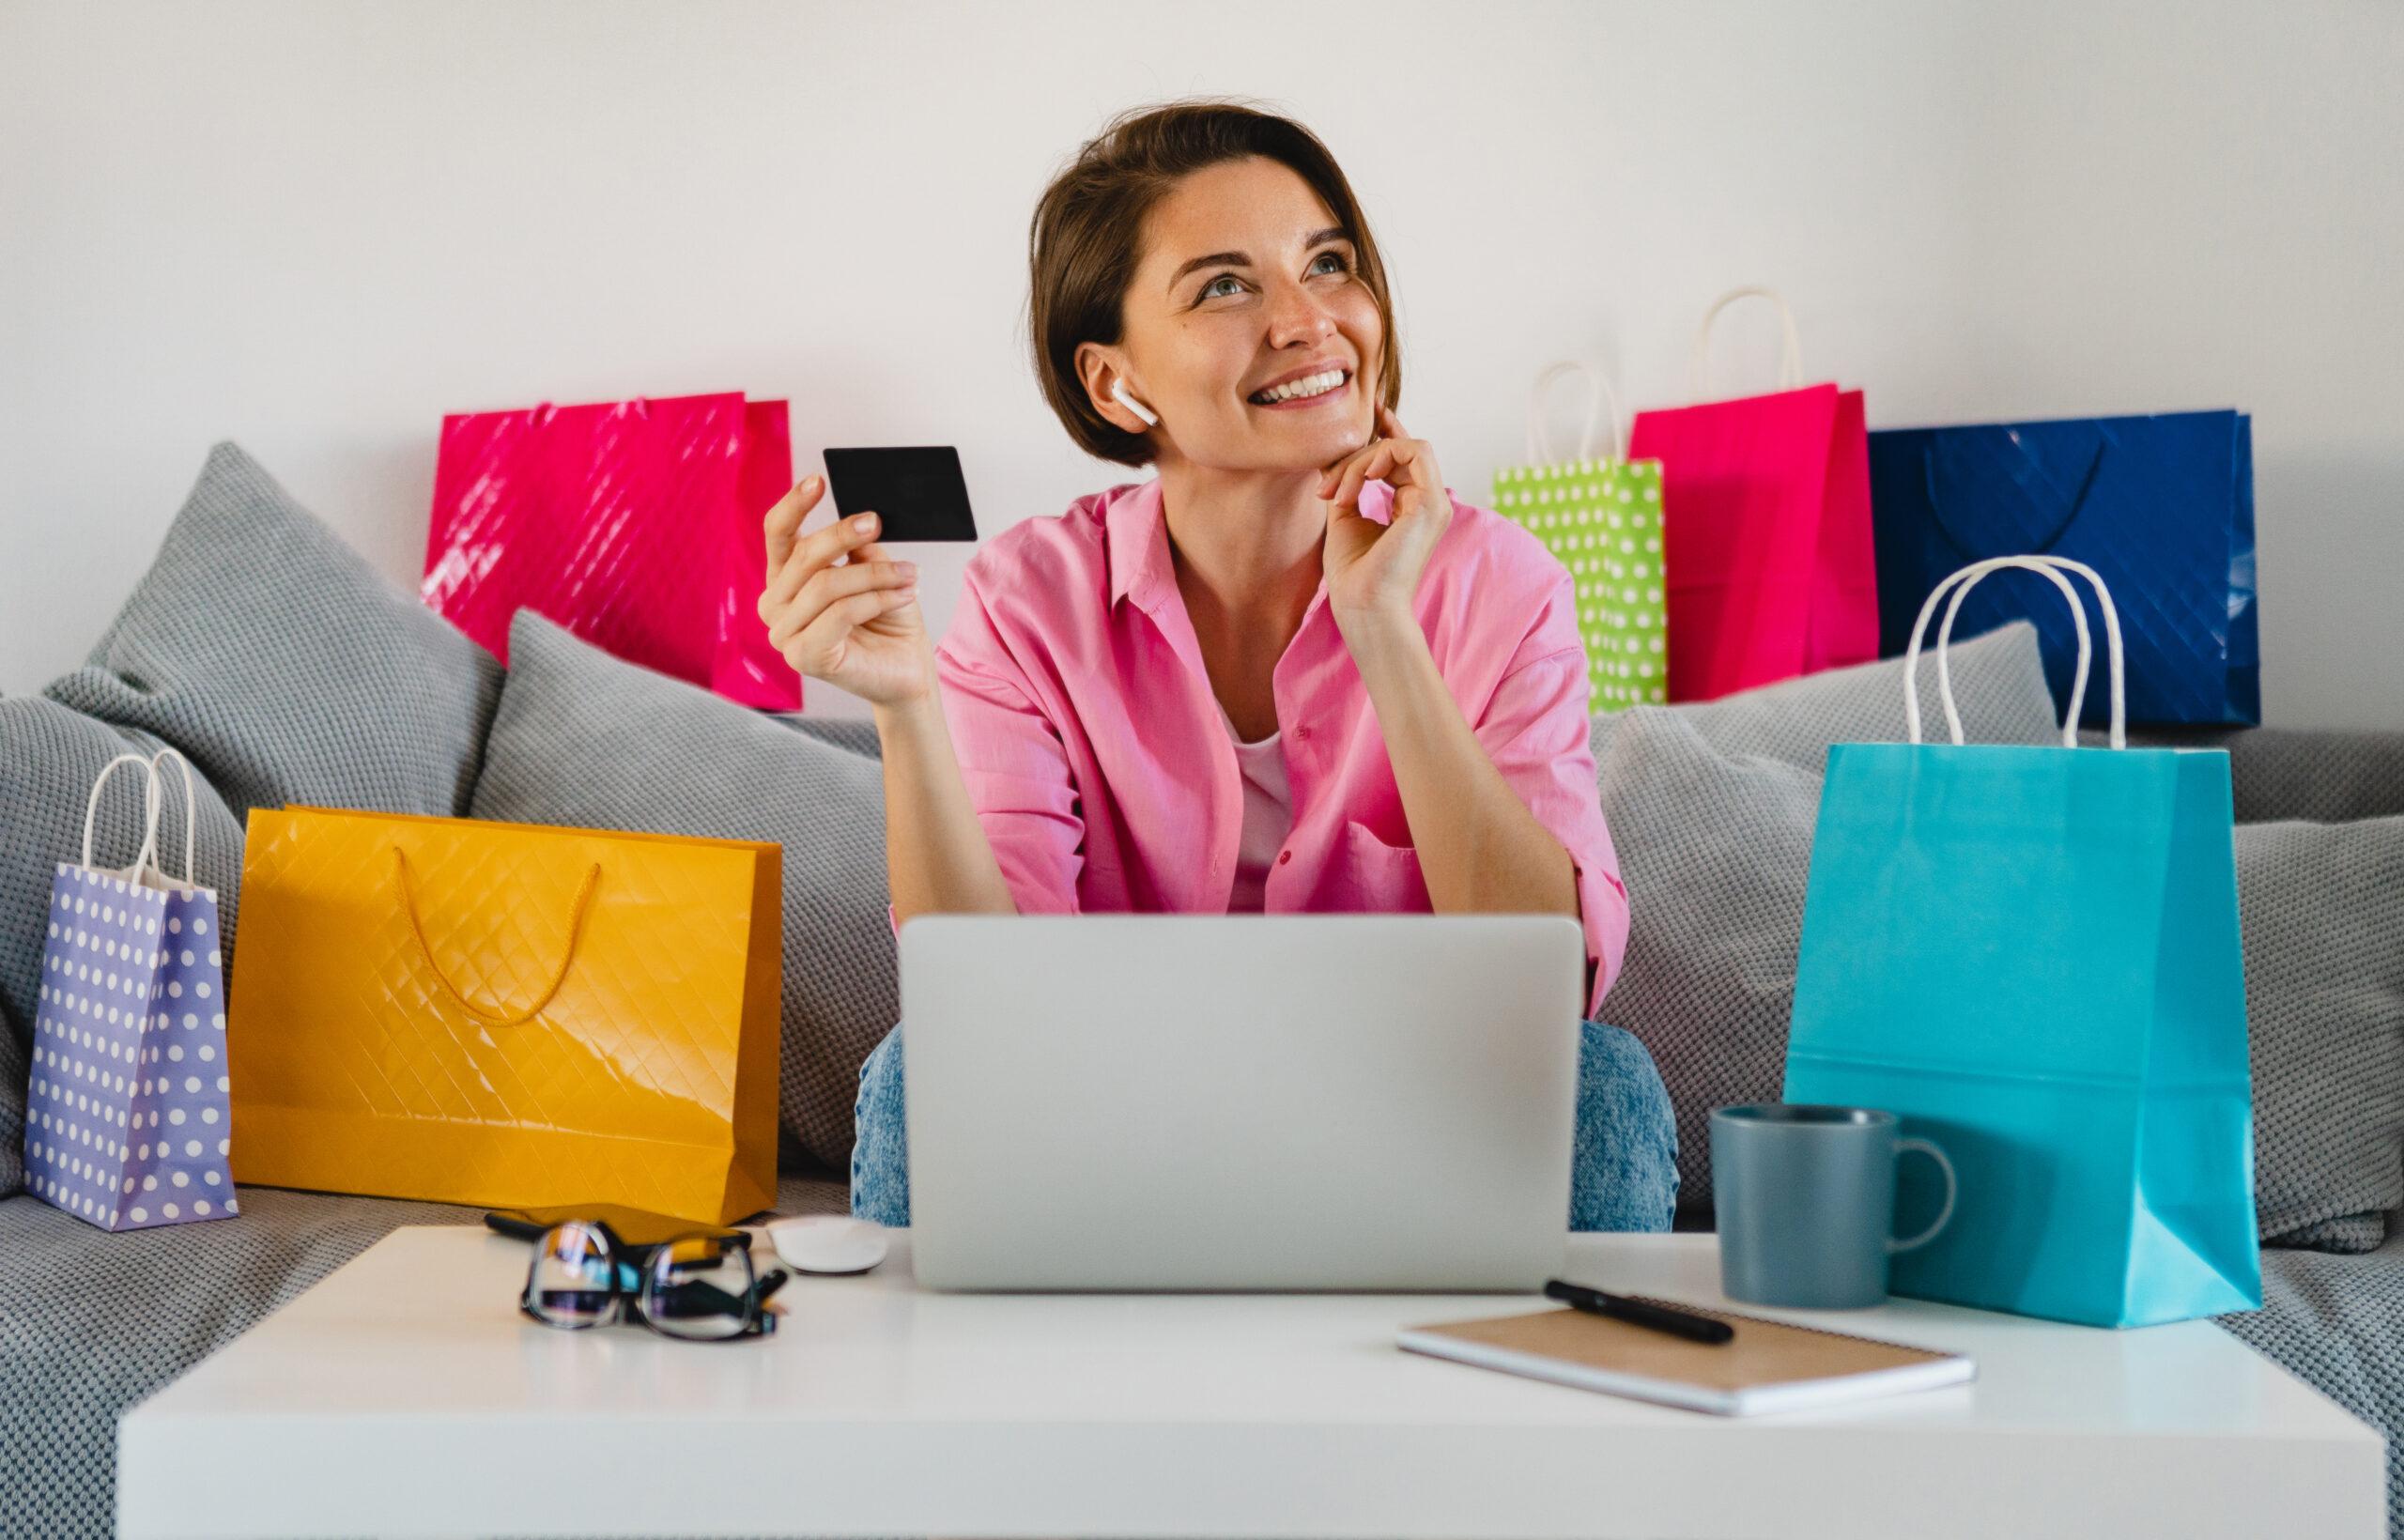 Retail-Compras-Online-Ecommerce-Lima-Perú